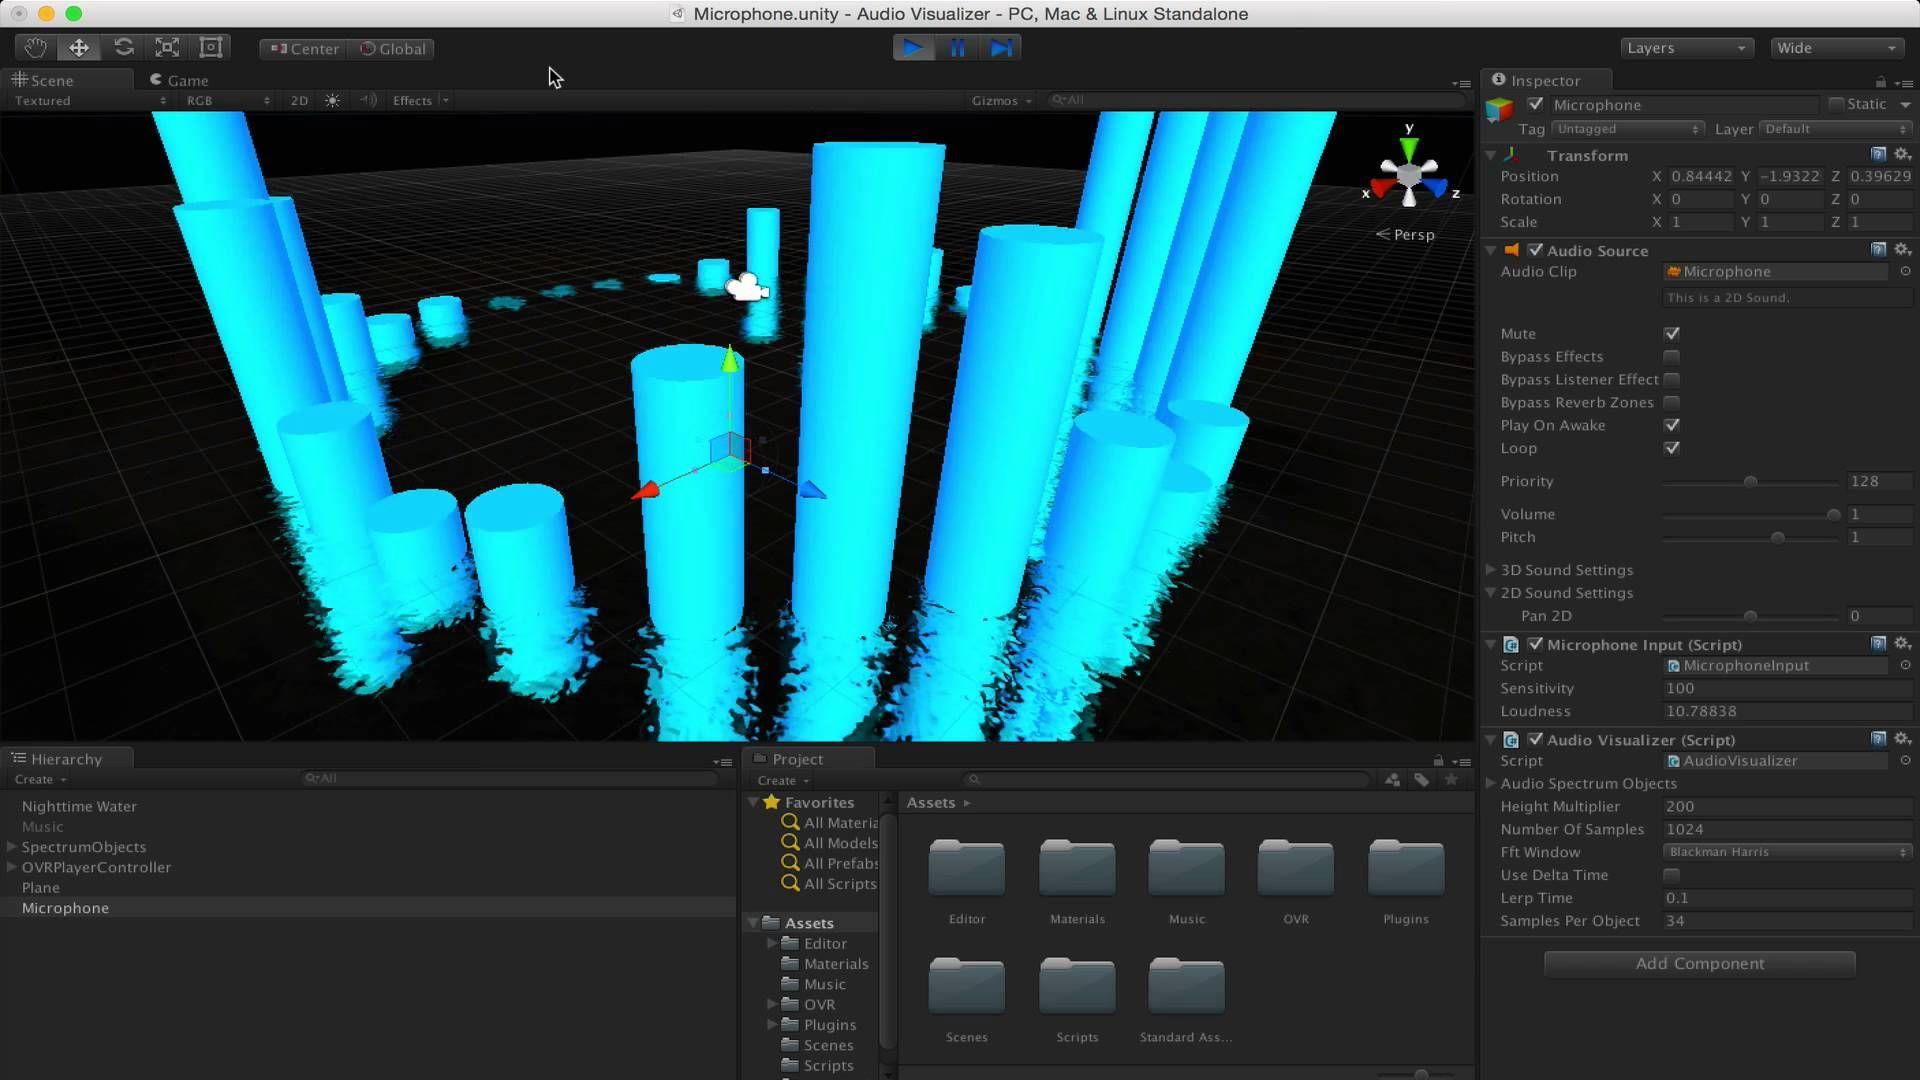 Audio Visualizer in Unity3D | VJ-Unity | Audio, Desktop